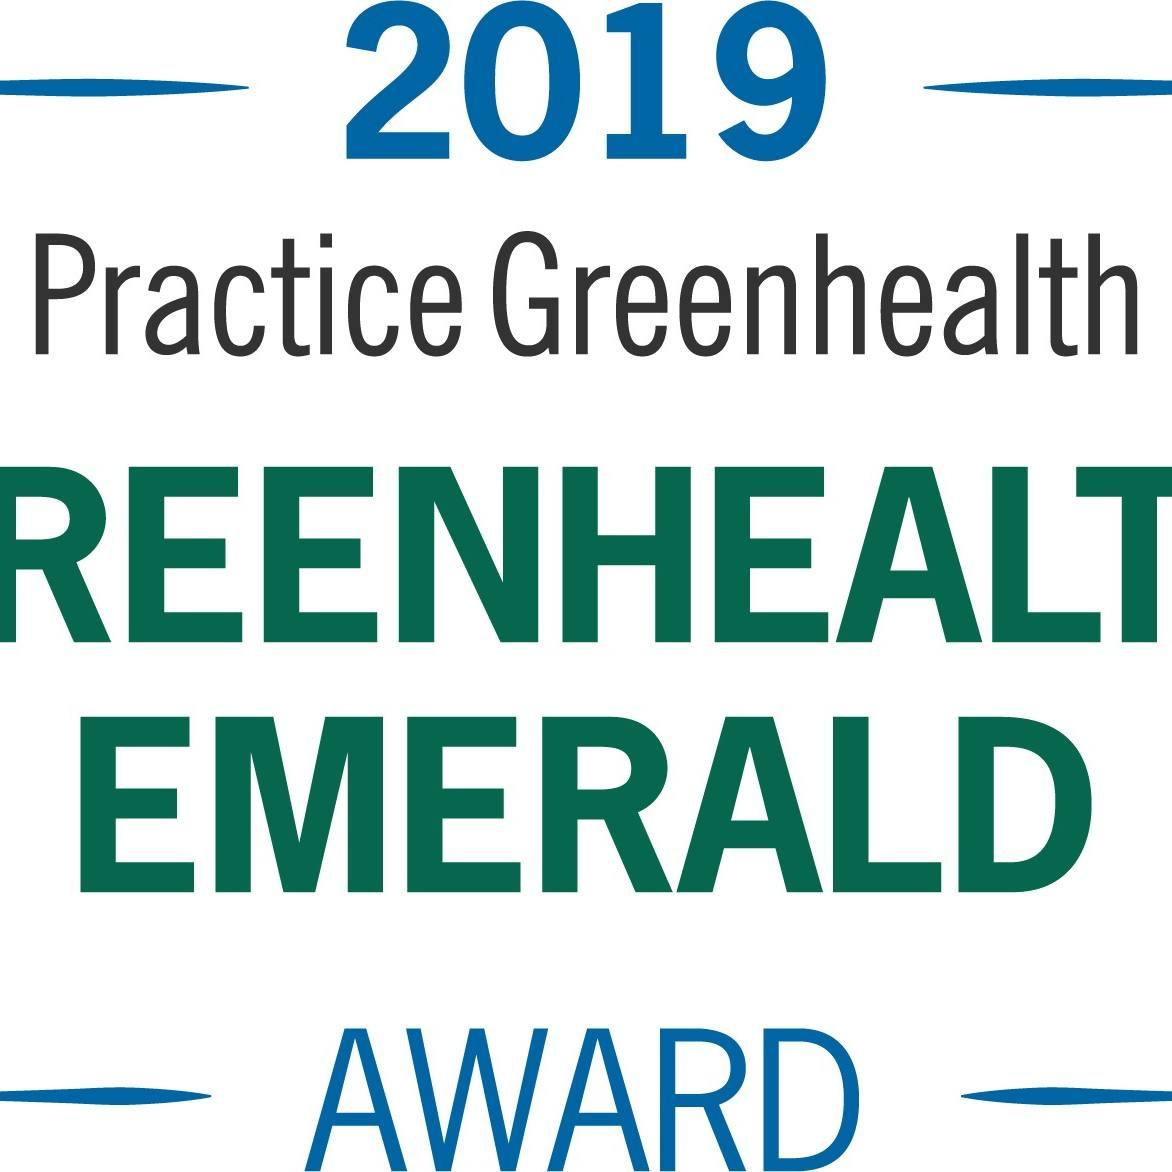 Practice Greenhealth Emerald Award 2019